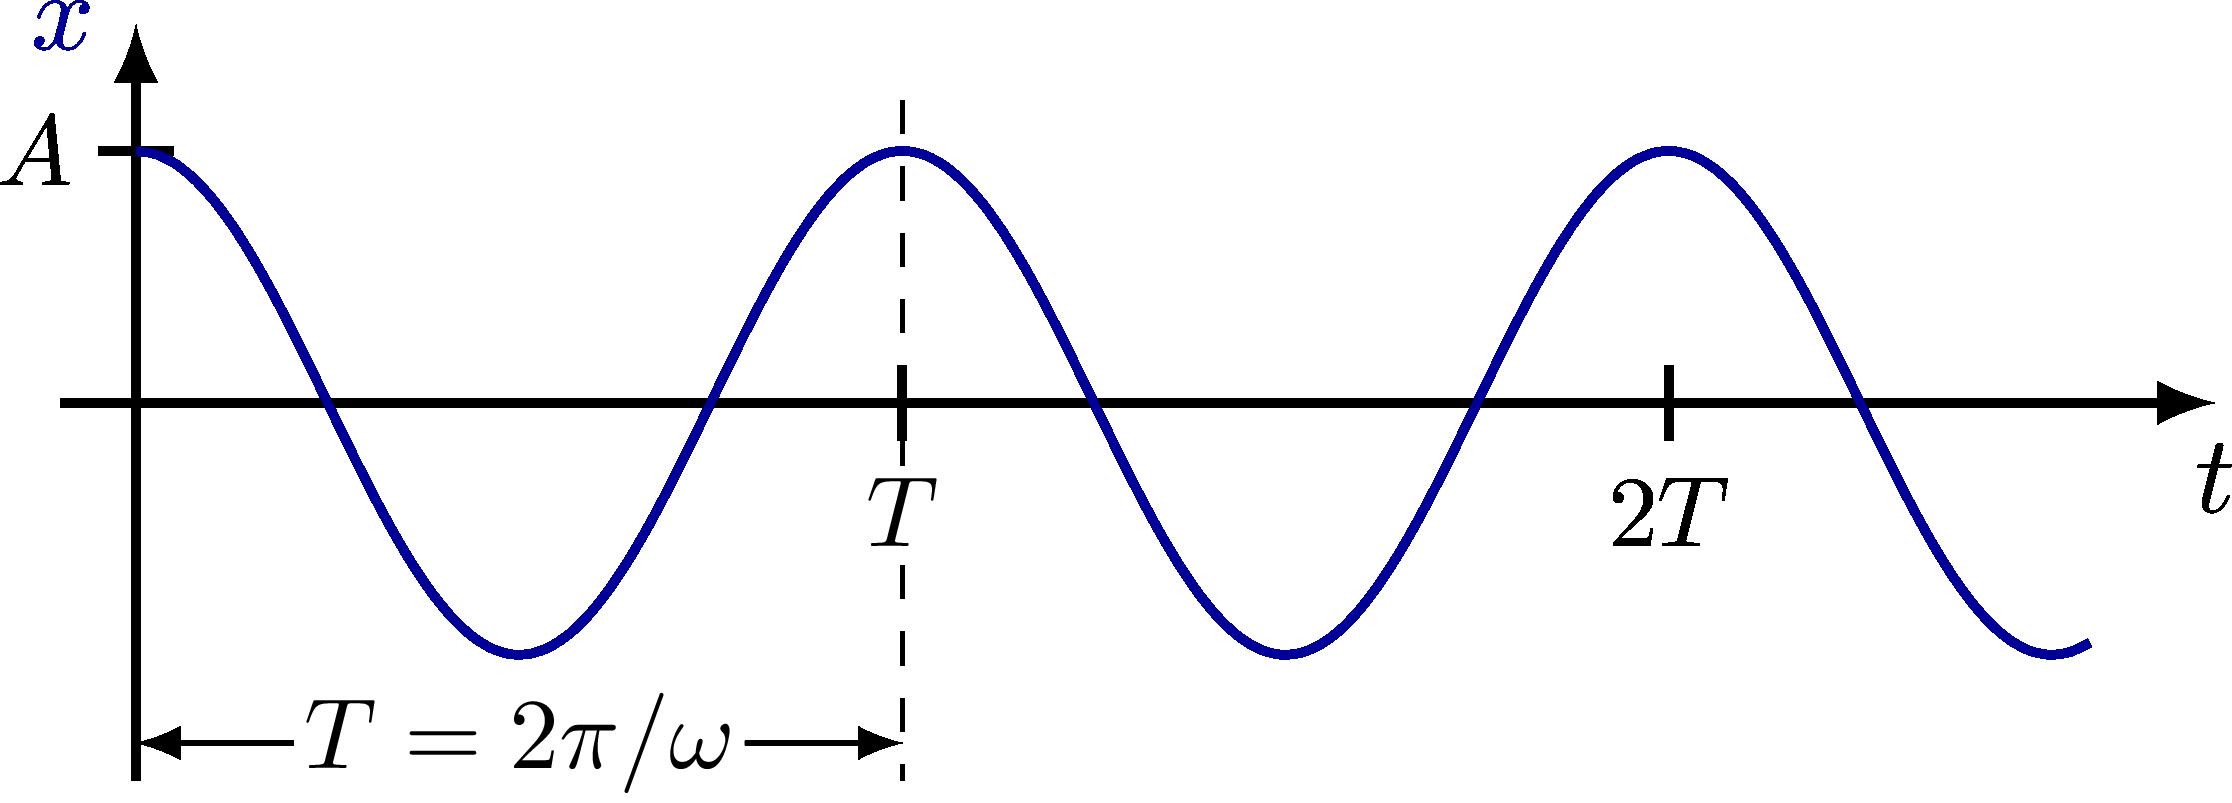 dynamics_oscillator-003.png